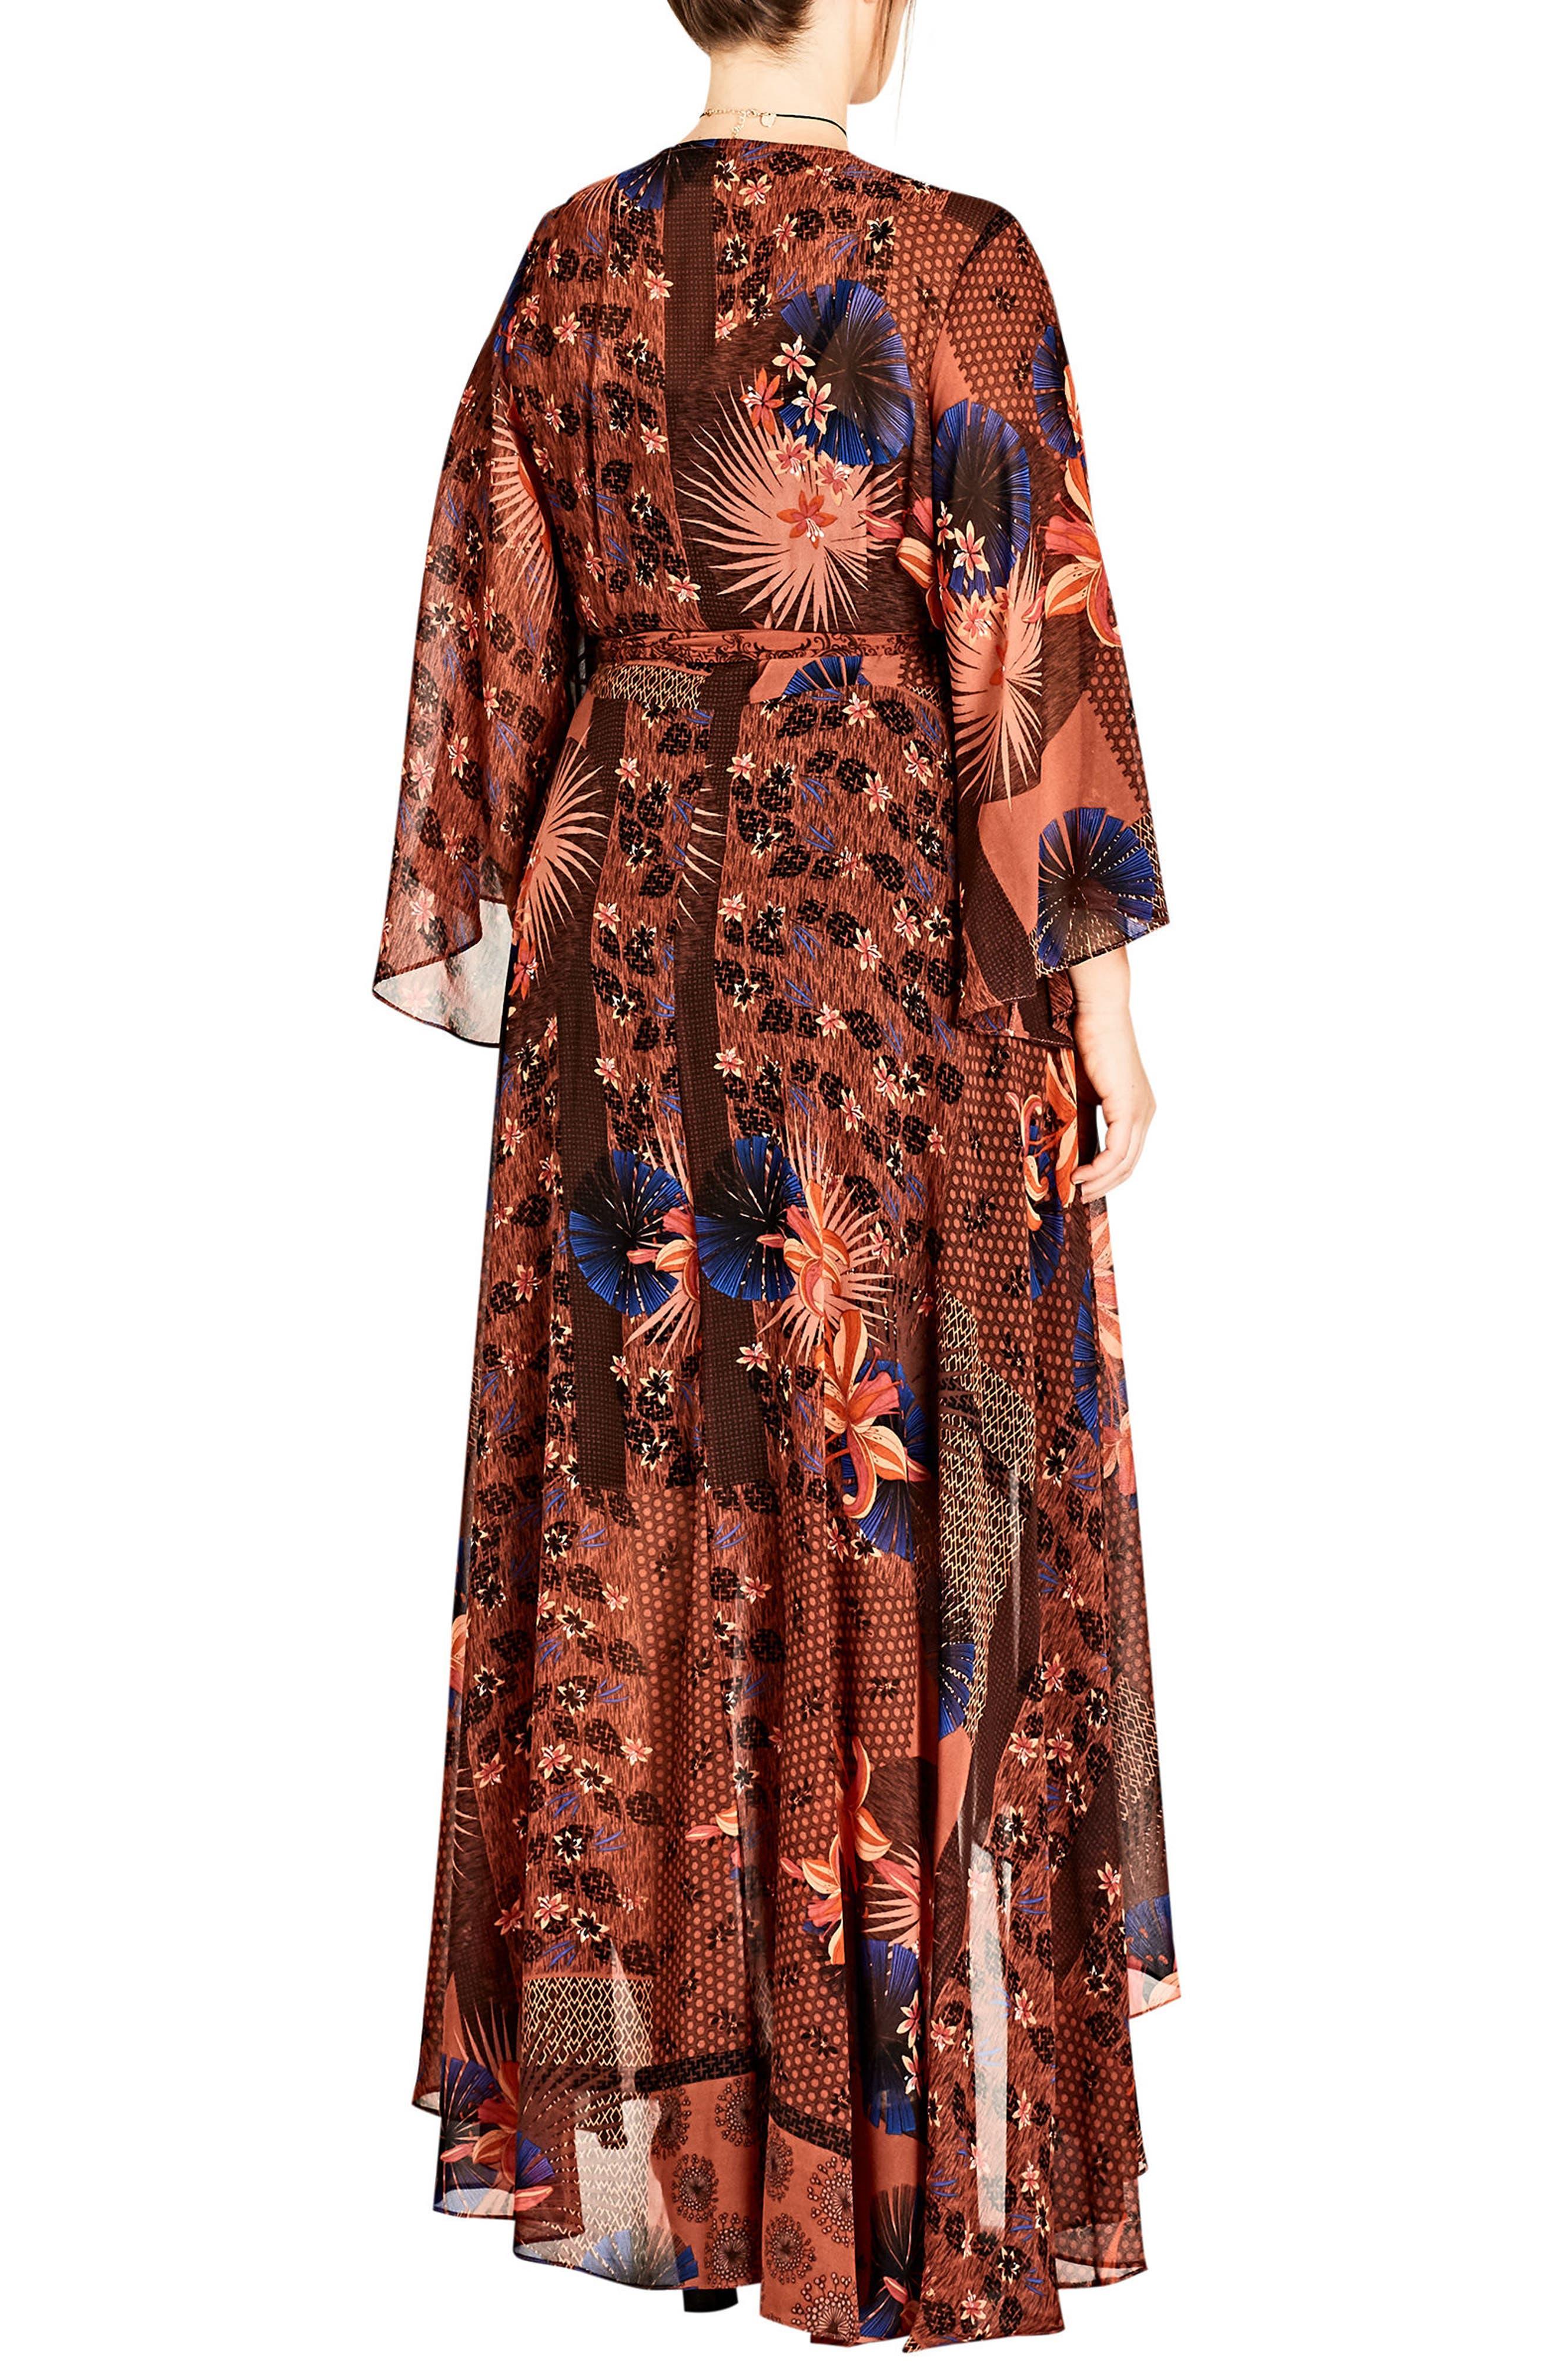 Patchwork Print Wrap Maxi Dress,                             Alternate thumbnail 2, color,                             609